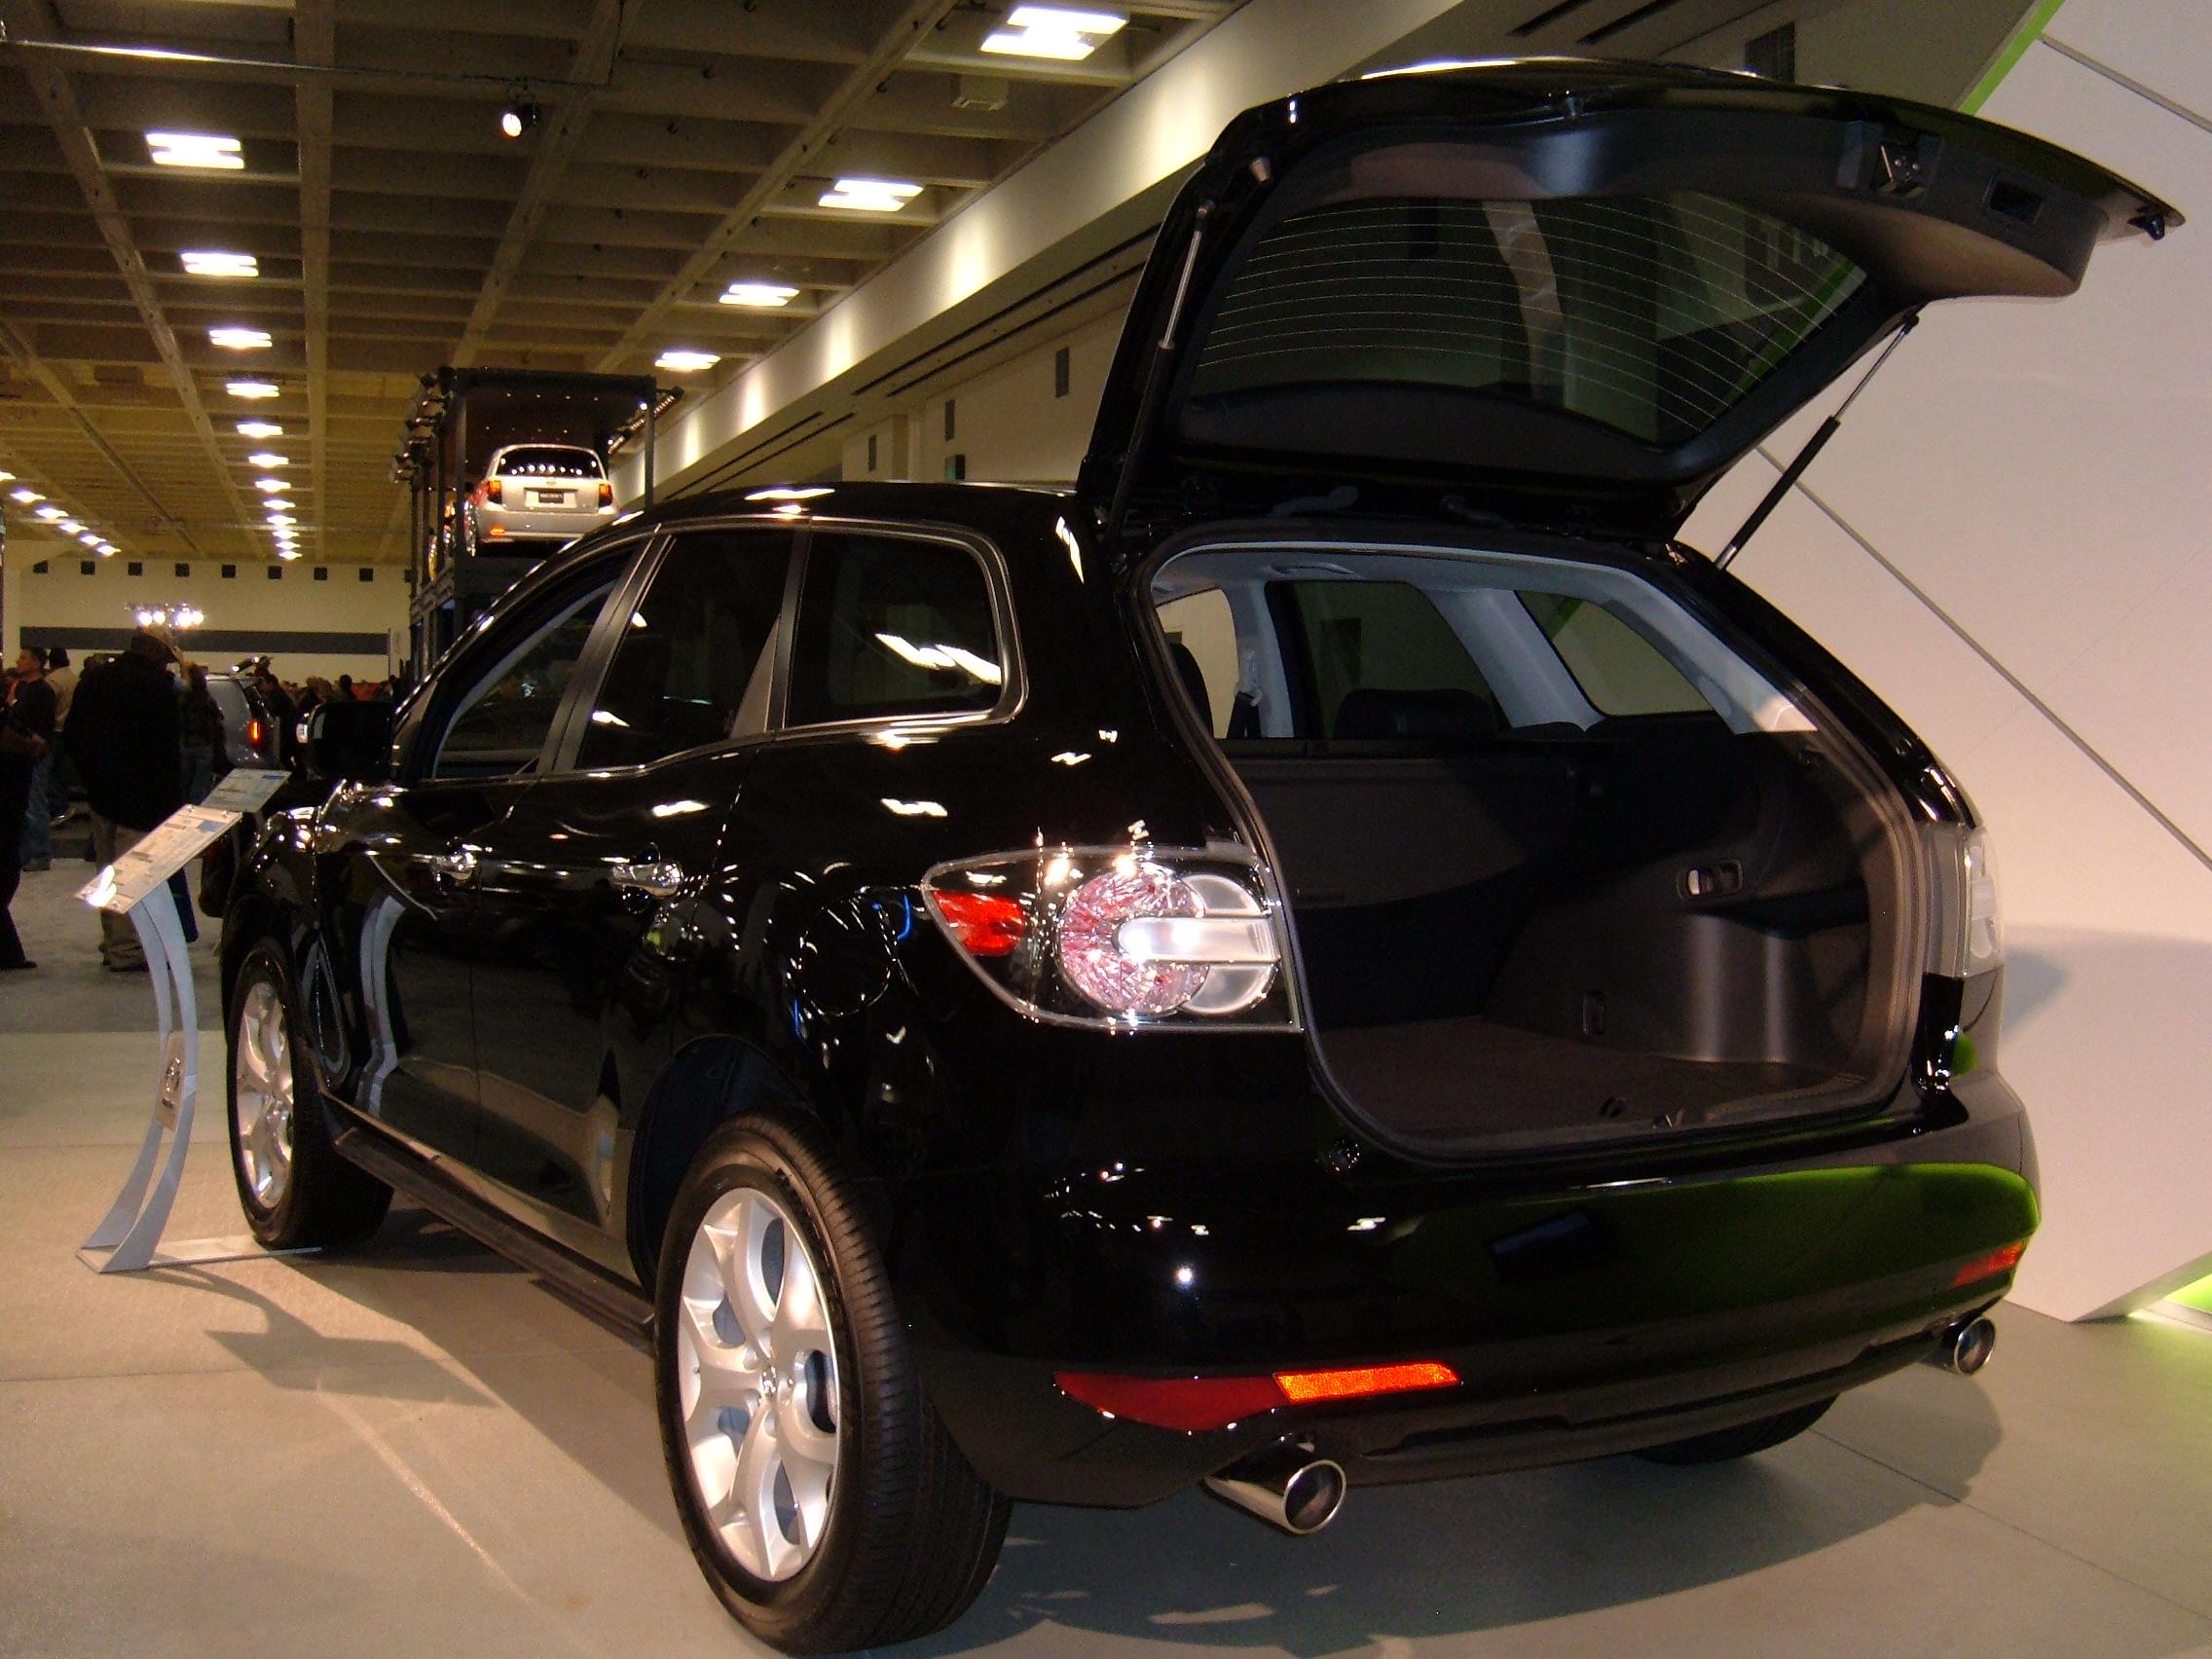 https://upload.wikimedia.org/wikipedia/commons/8/8b/2010_black_Mazda_CX-7_rear.JPG